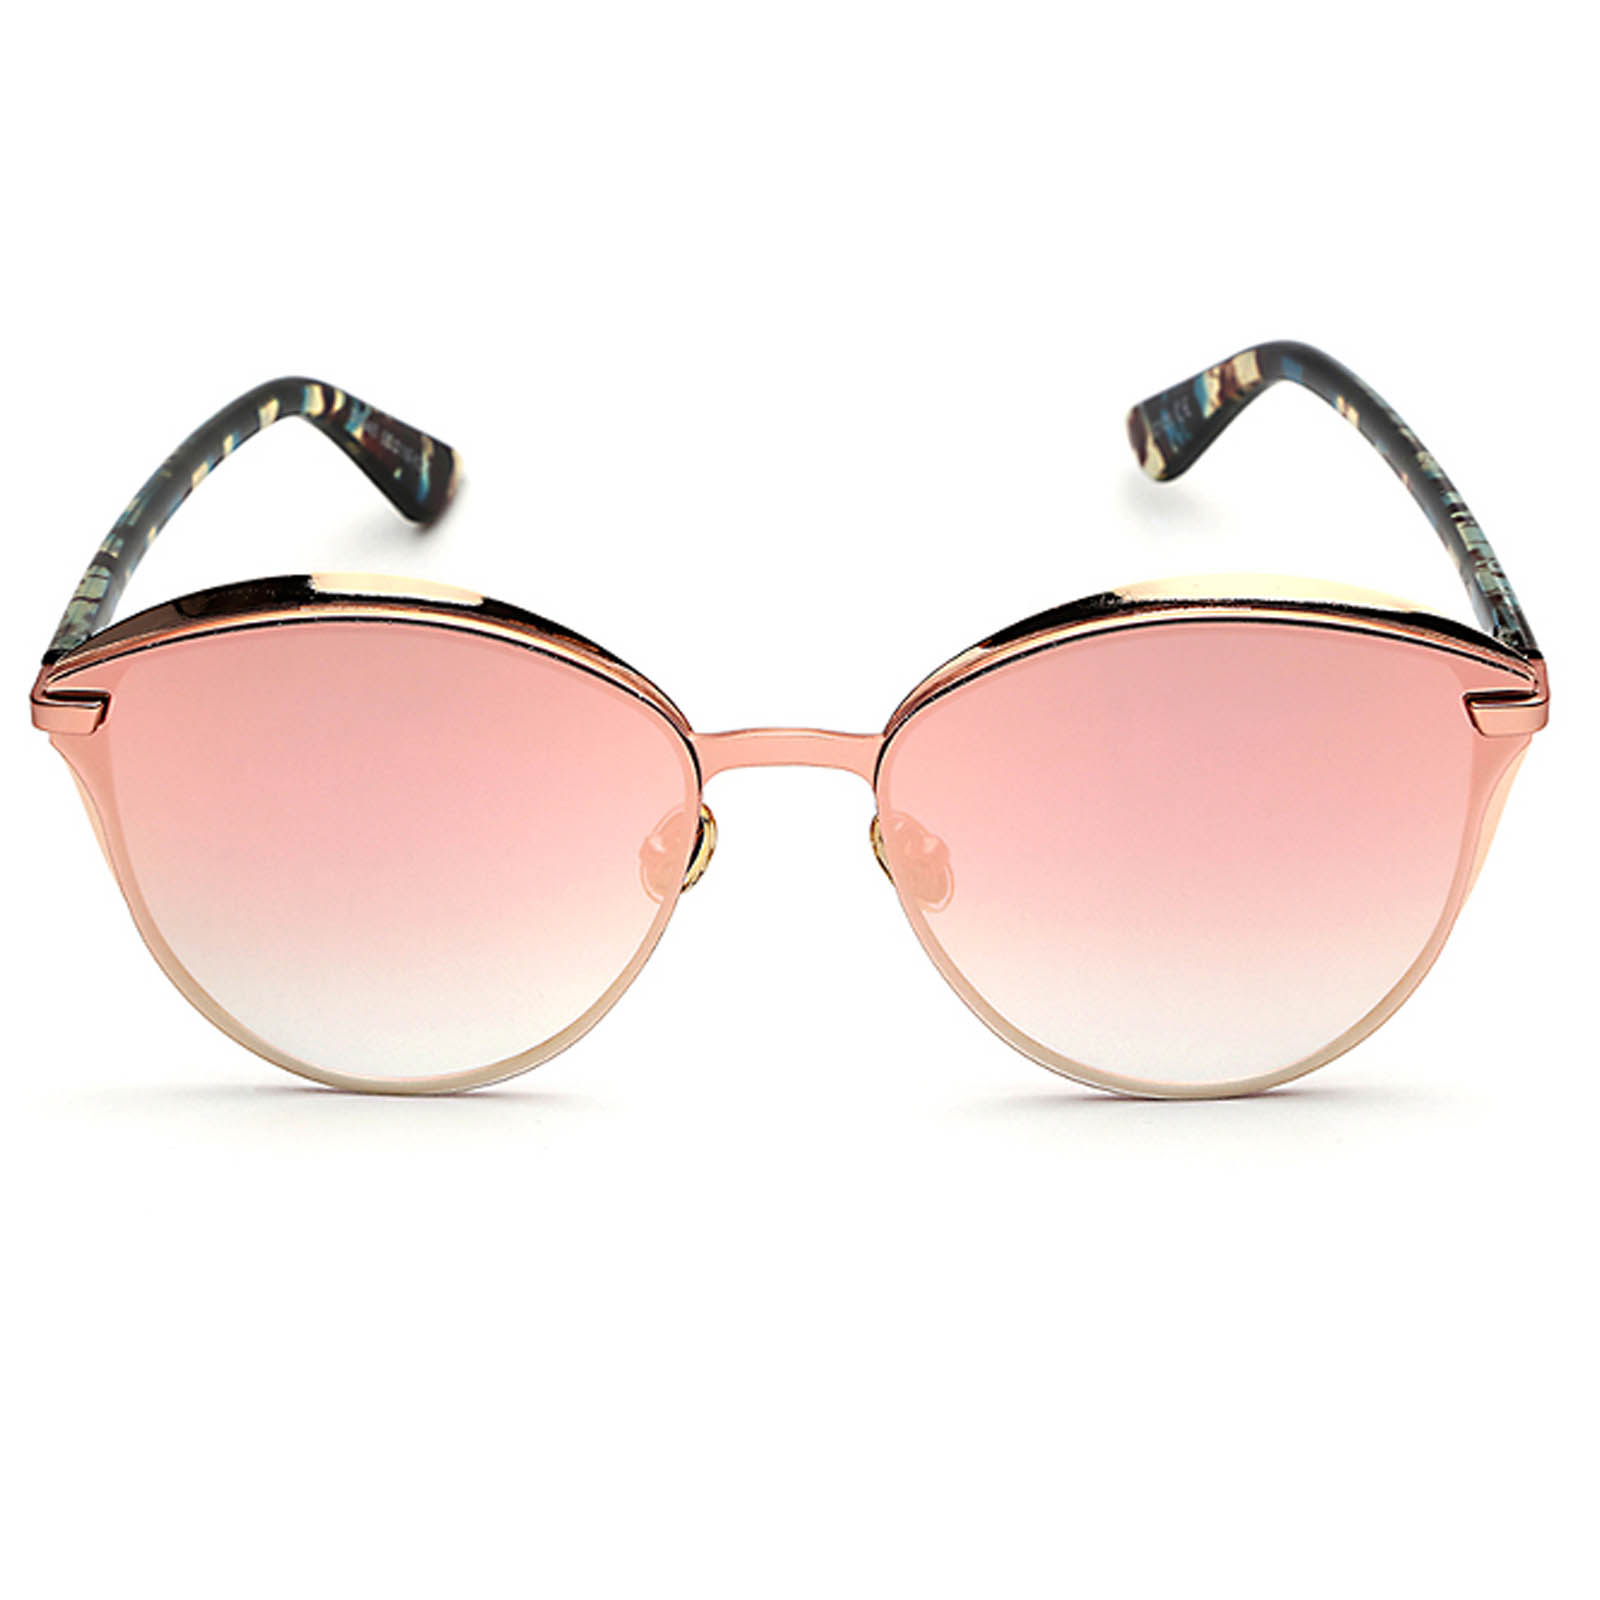 477cc5dc49 ... OWL ® 017 C4 Cat Round Eyewear Sunglasses Women s Men s Metal Round  Floral Frame Pink Lens